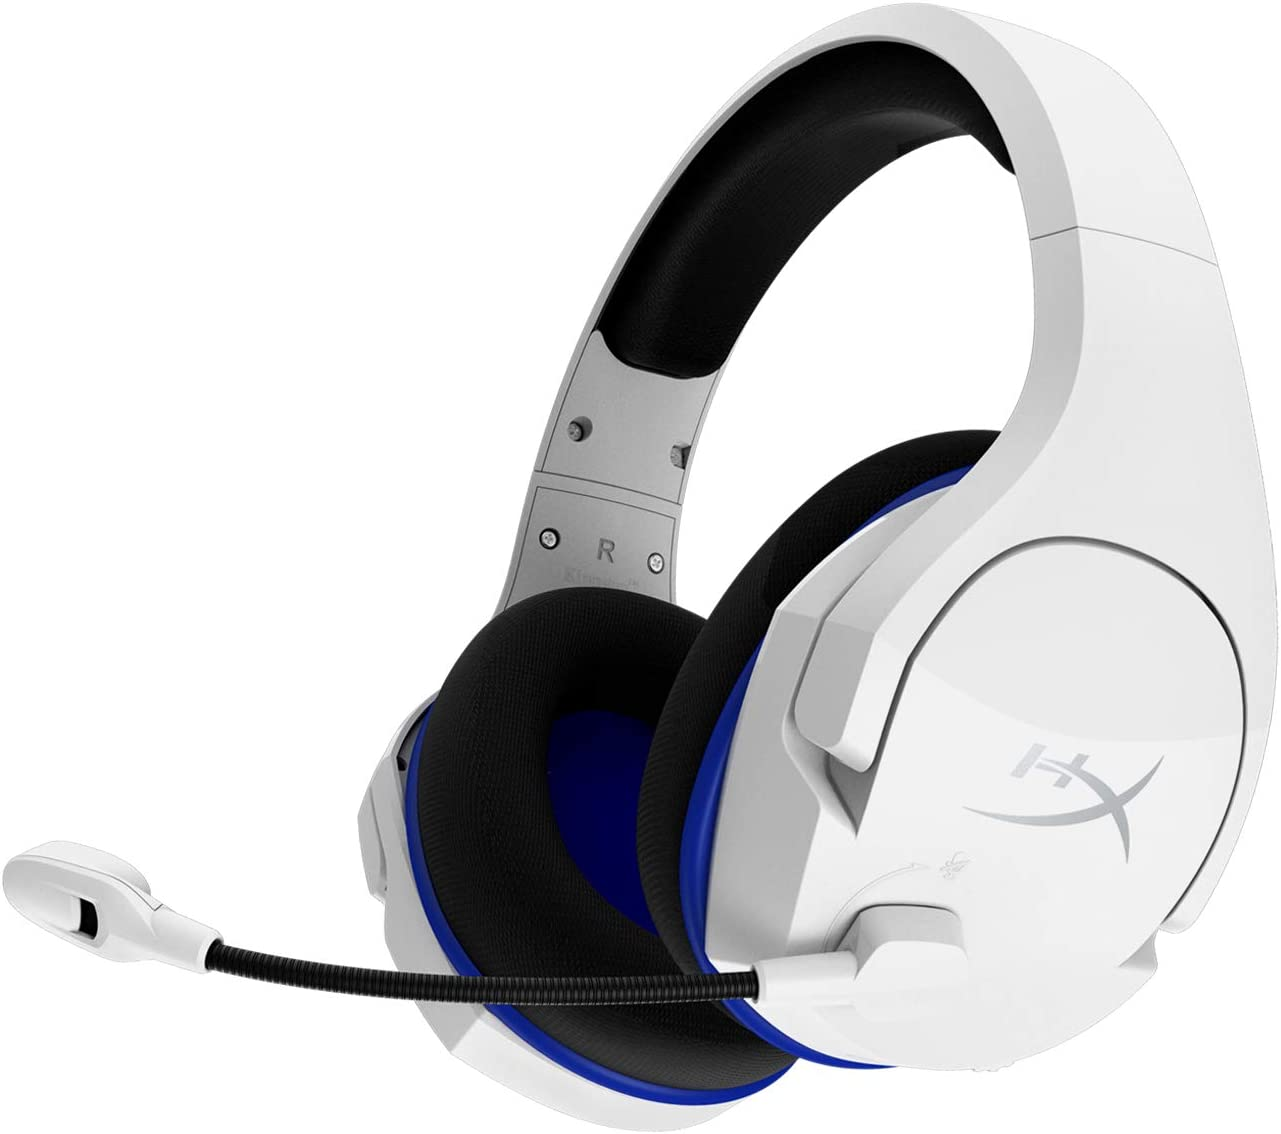 Best Mac Gaming Headset